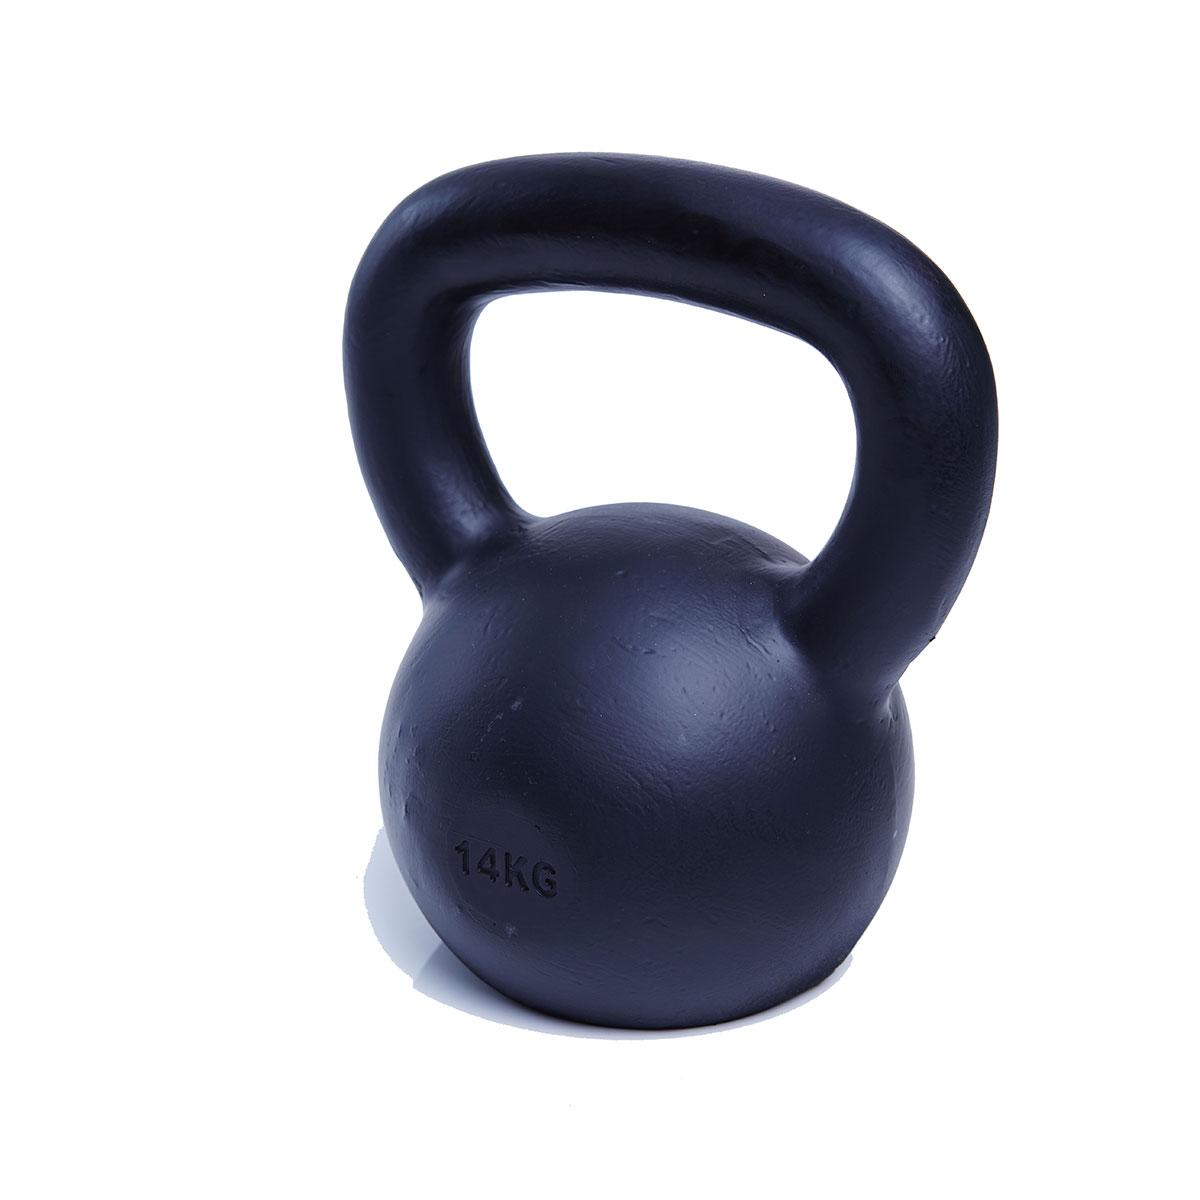 Kettlebell 14kg Wellness